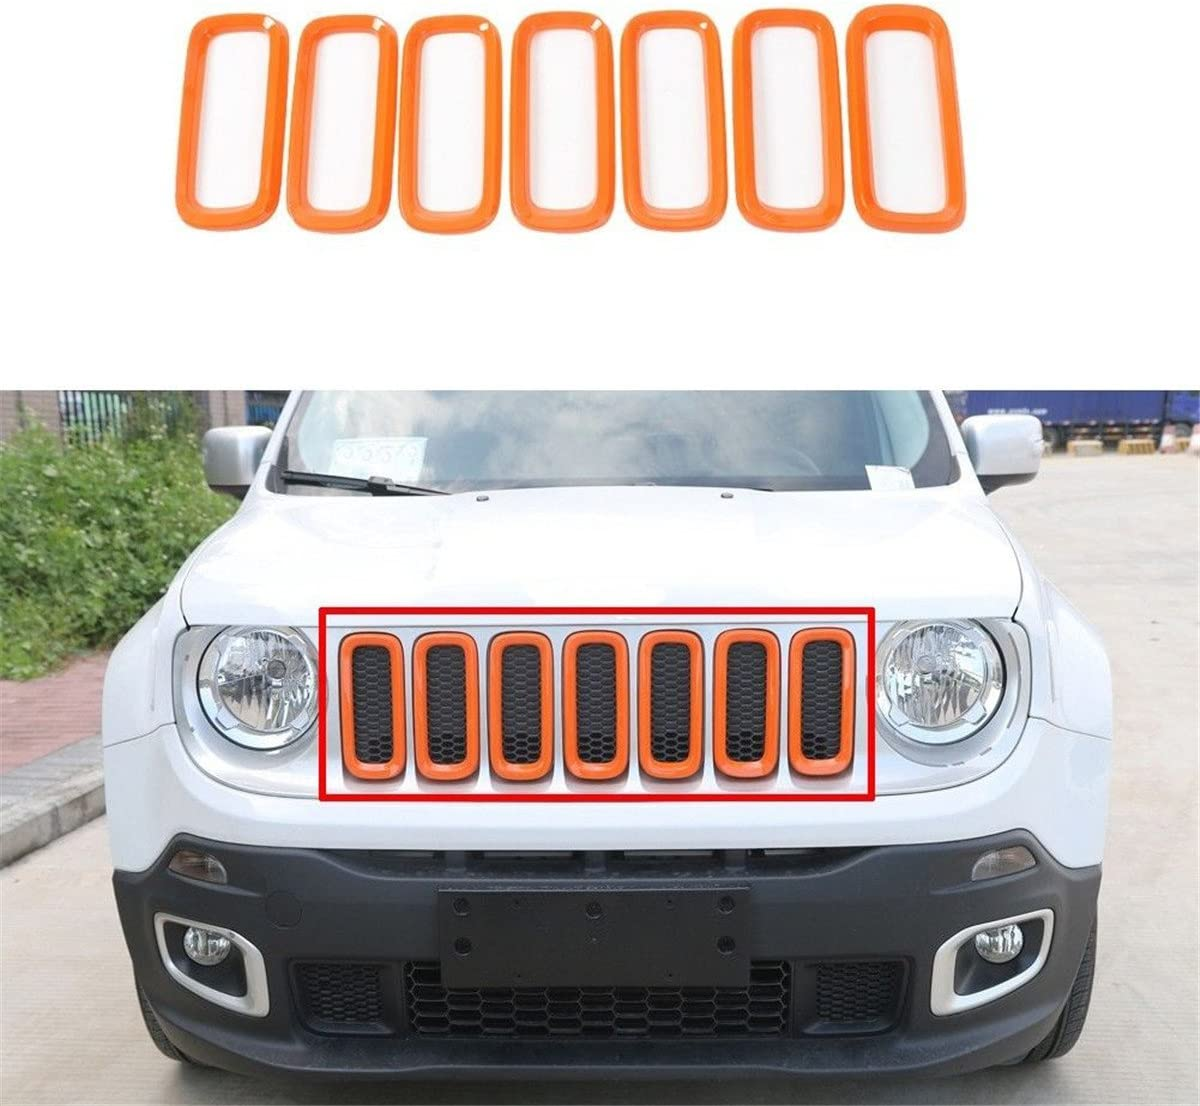 FMtoppeak Orange ABS Car Front Grille Trims Mesh Frame Insert ...